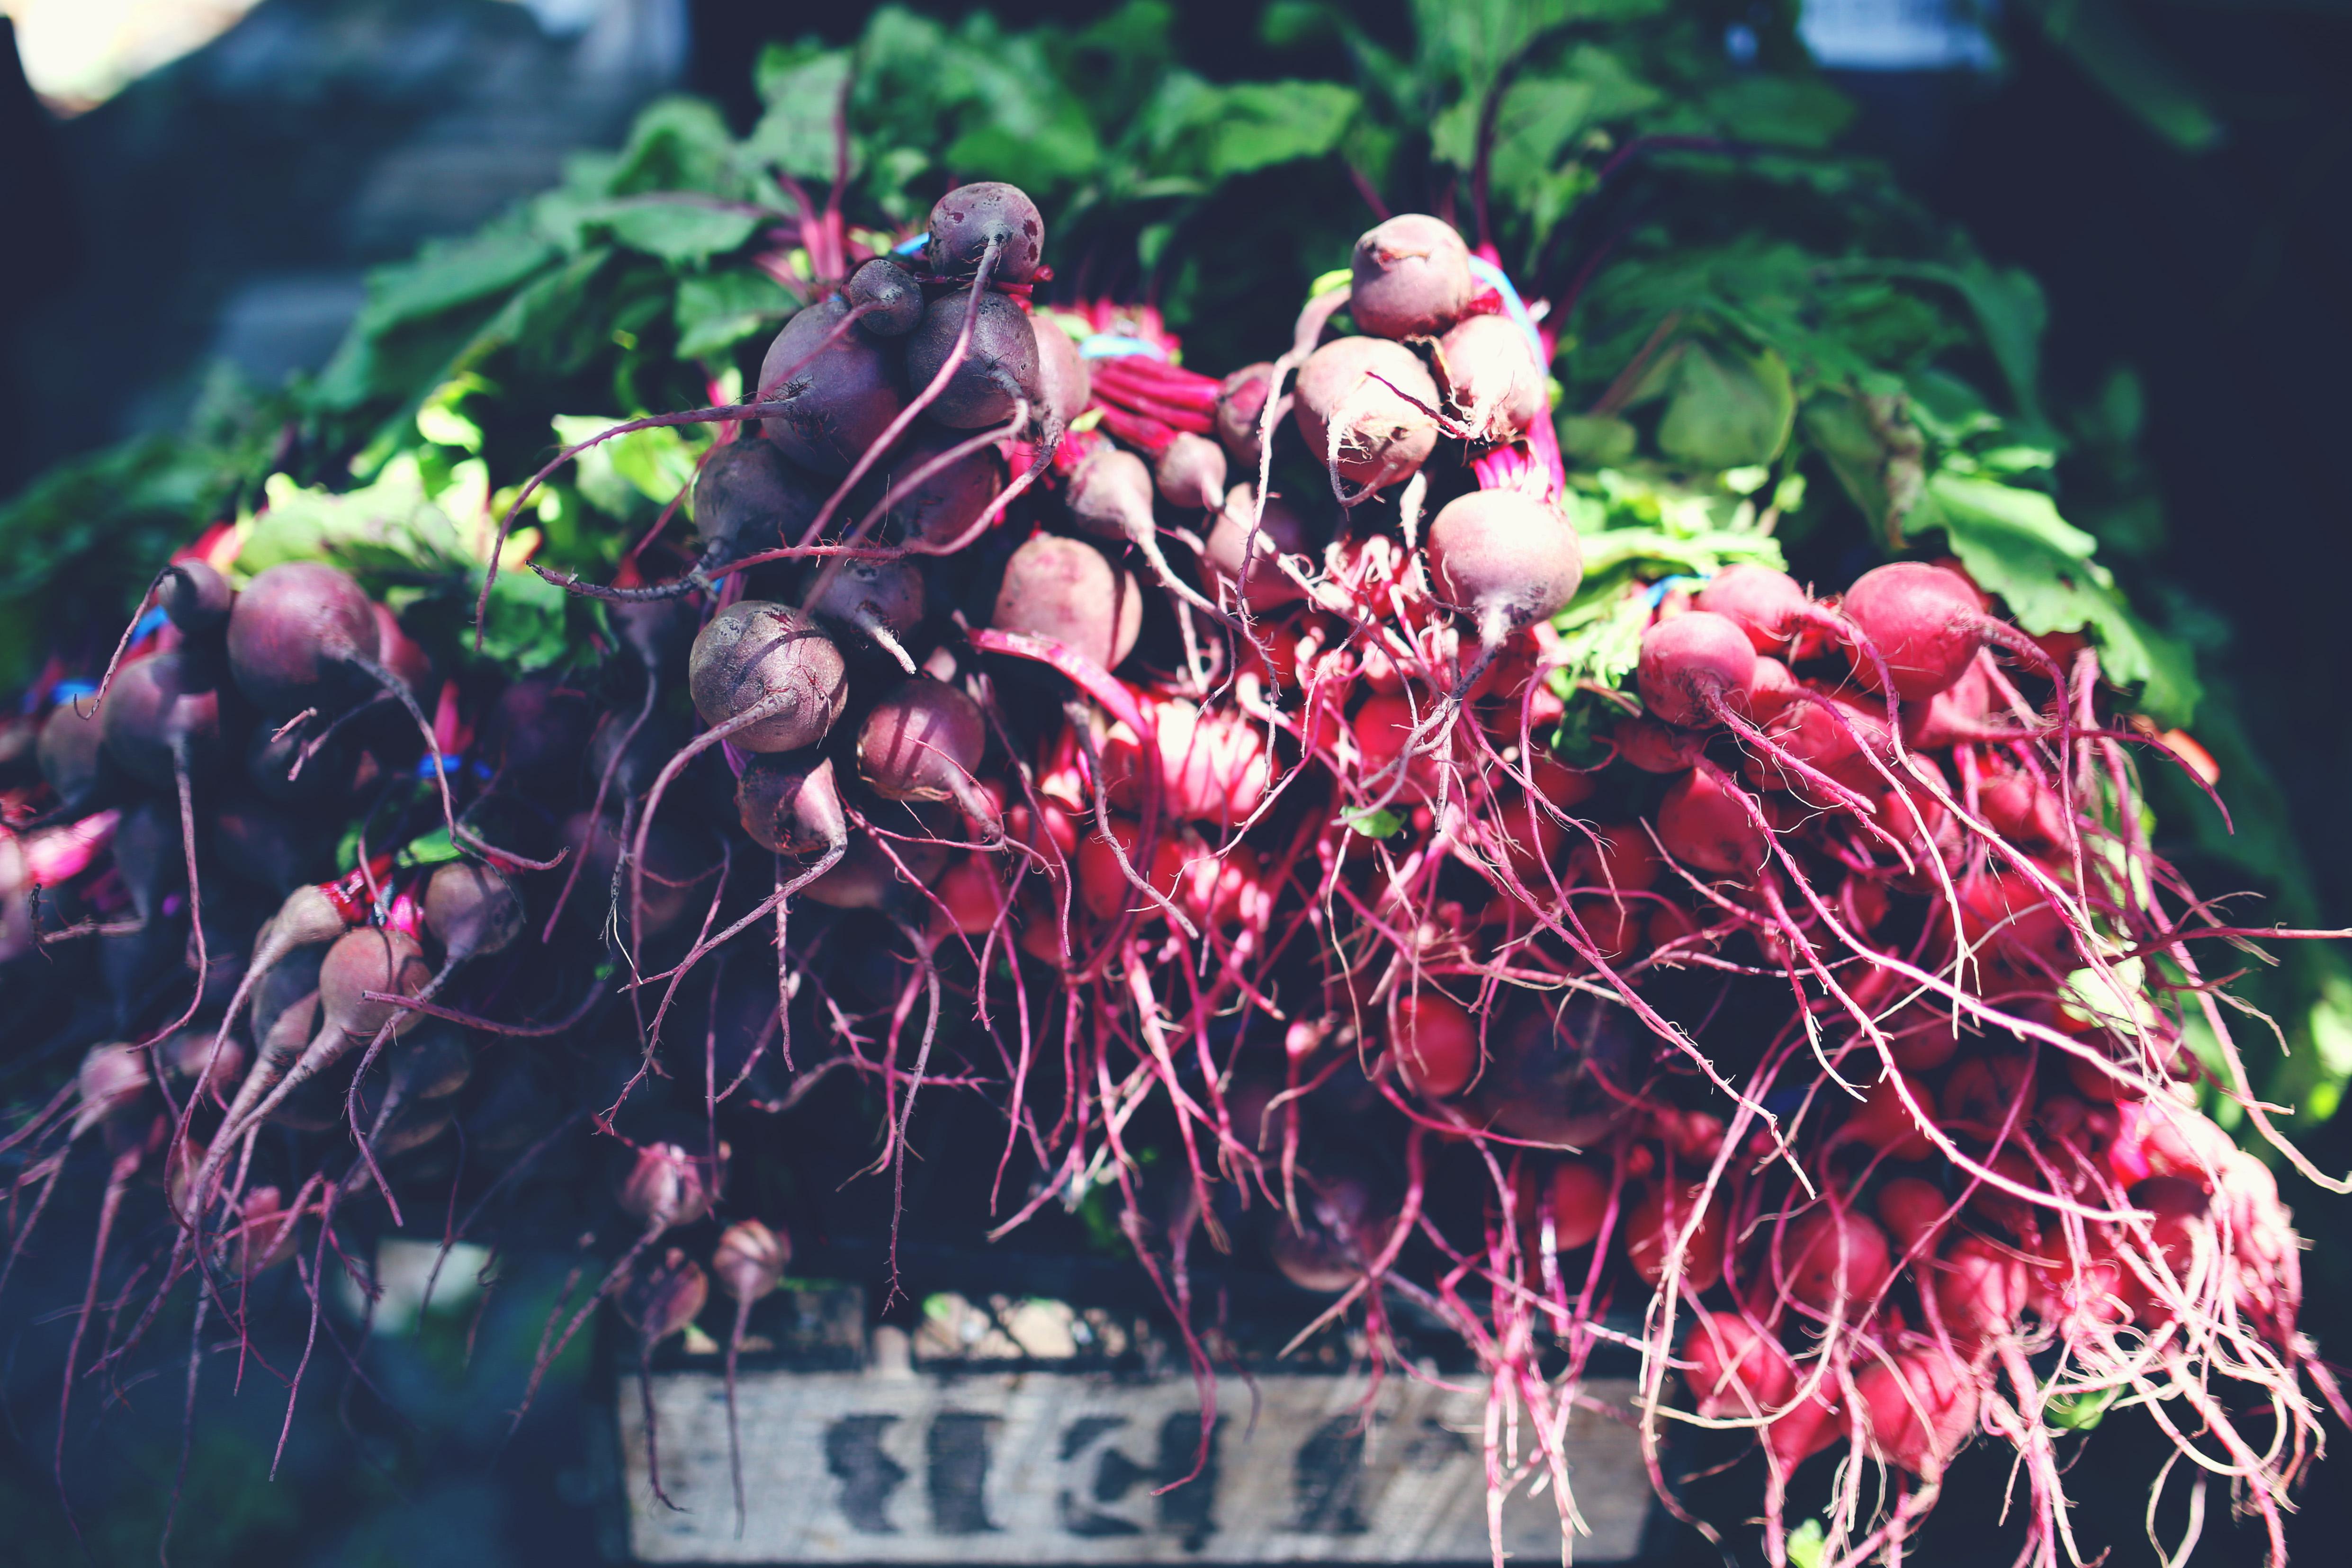 beets at the farmers market, market, gardening, garden media group, millennials, edibles, millennials and edibles, planting edibles, millennials and the garden